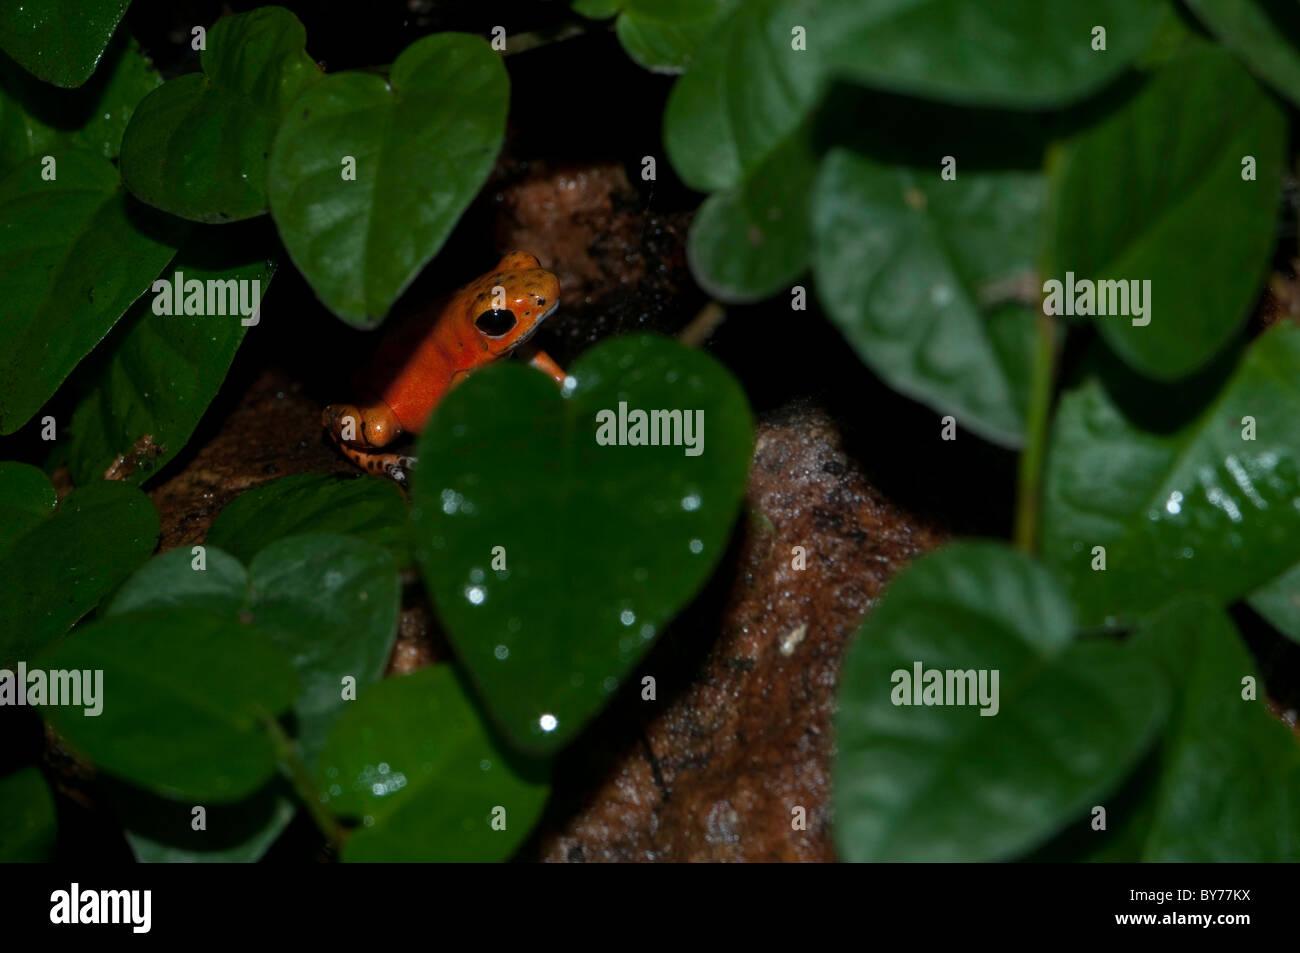 Strawberry poison dart frog. - Stock Image